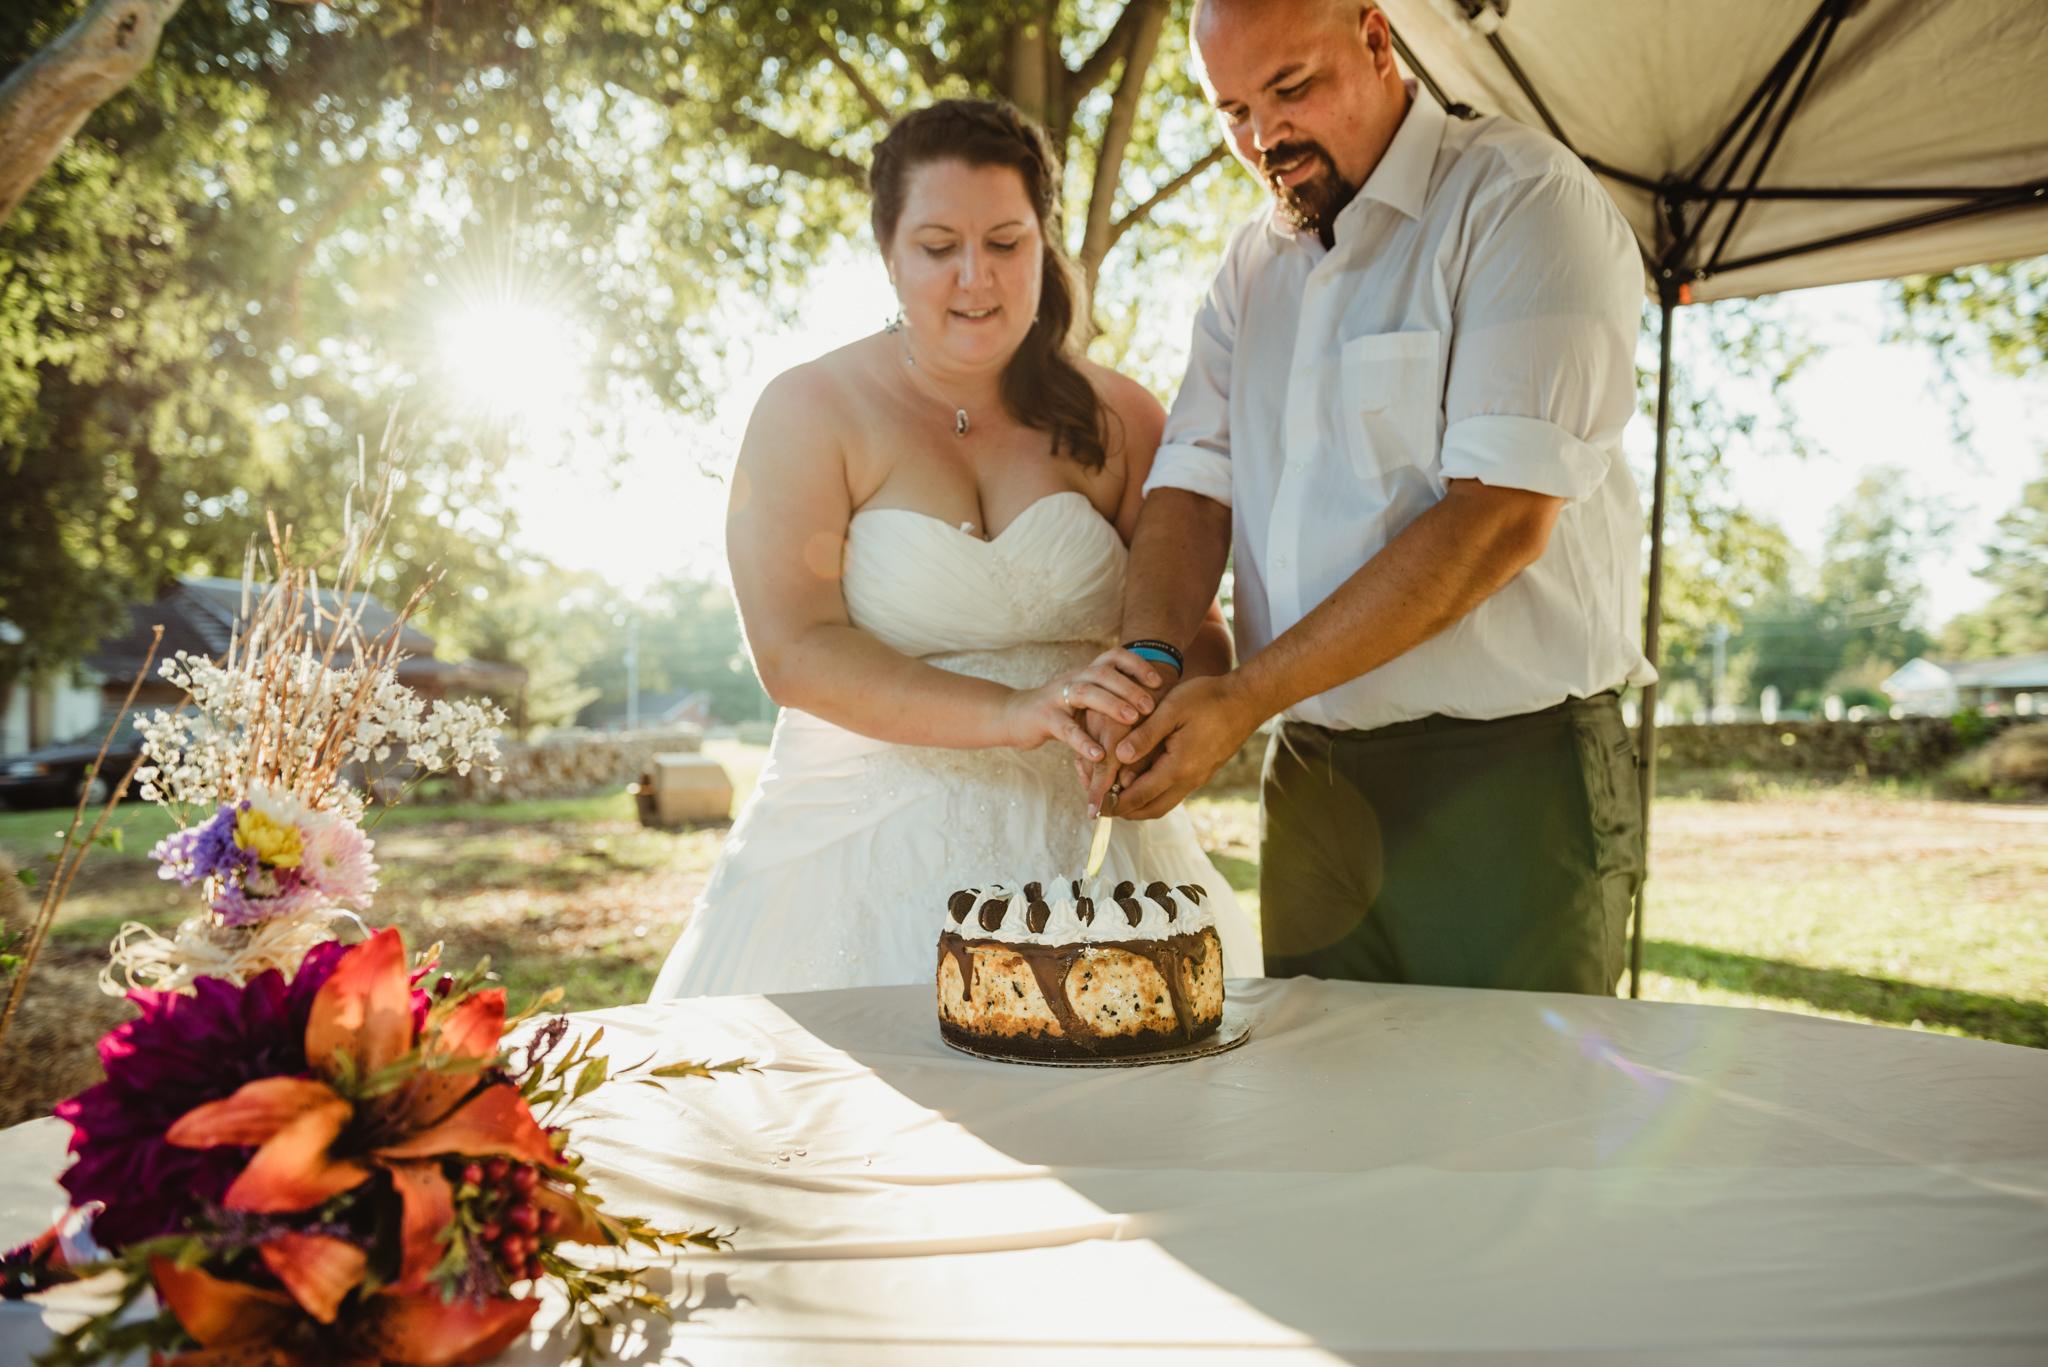 raleigh-wedding-outdoor-reception-cake-cutting-cd.jpg